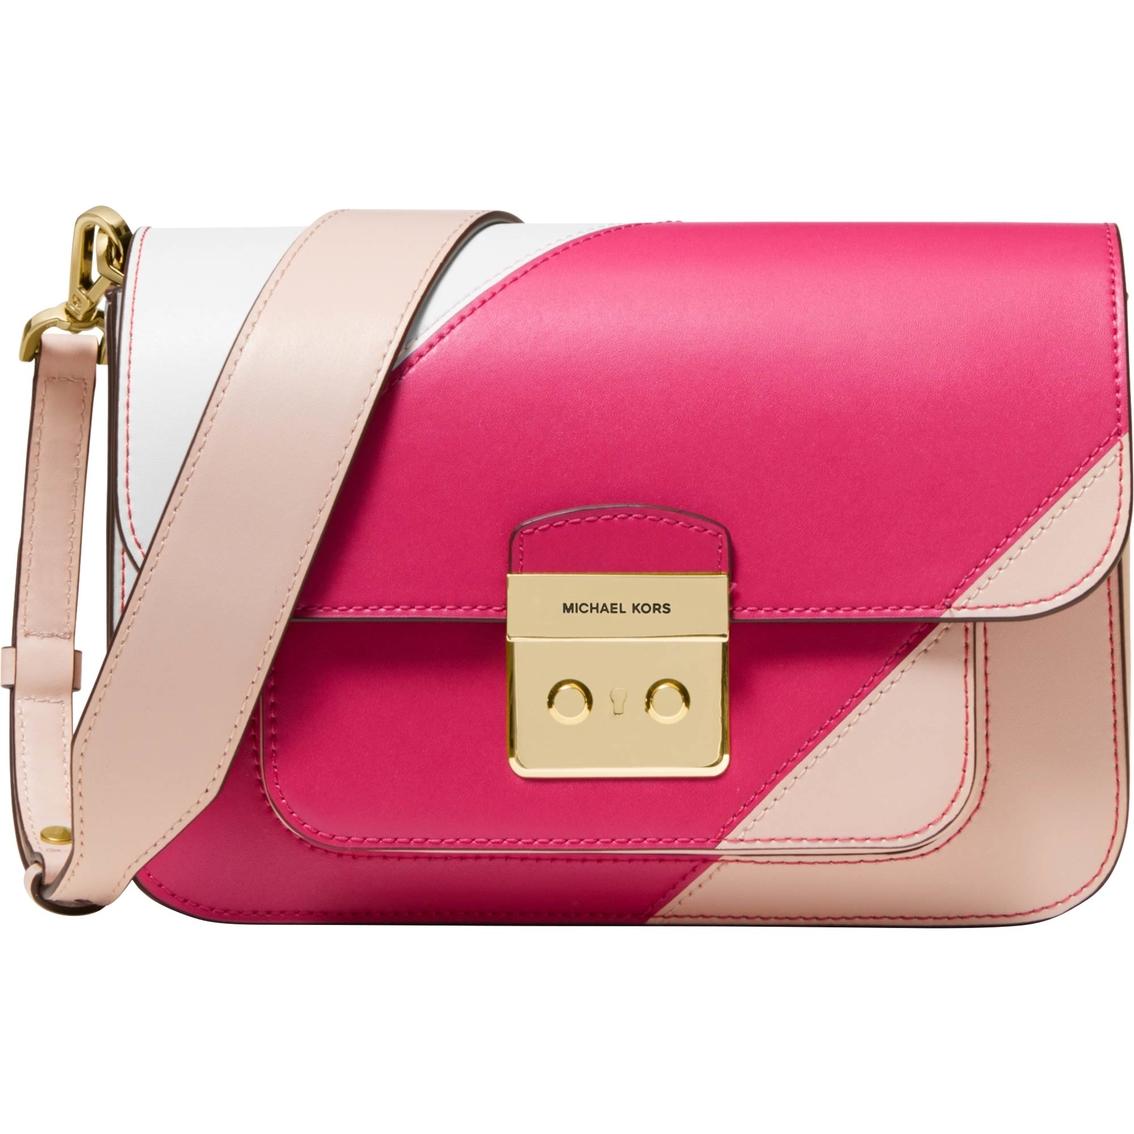 09c71a9b43a8 Michael Kors Sloan Editor Large Shoulder Handbag | Shoulder Bags ...